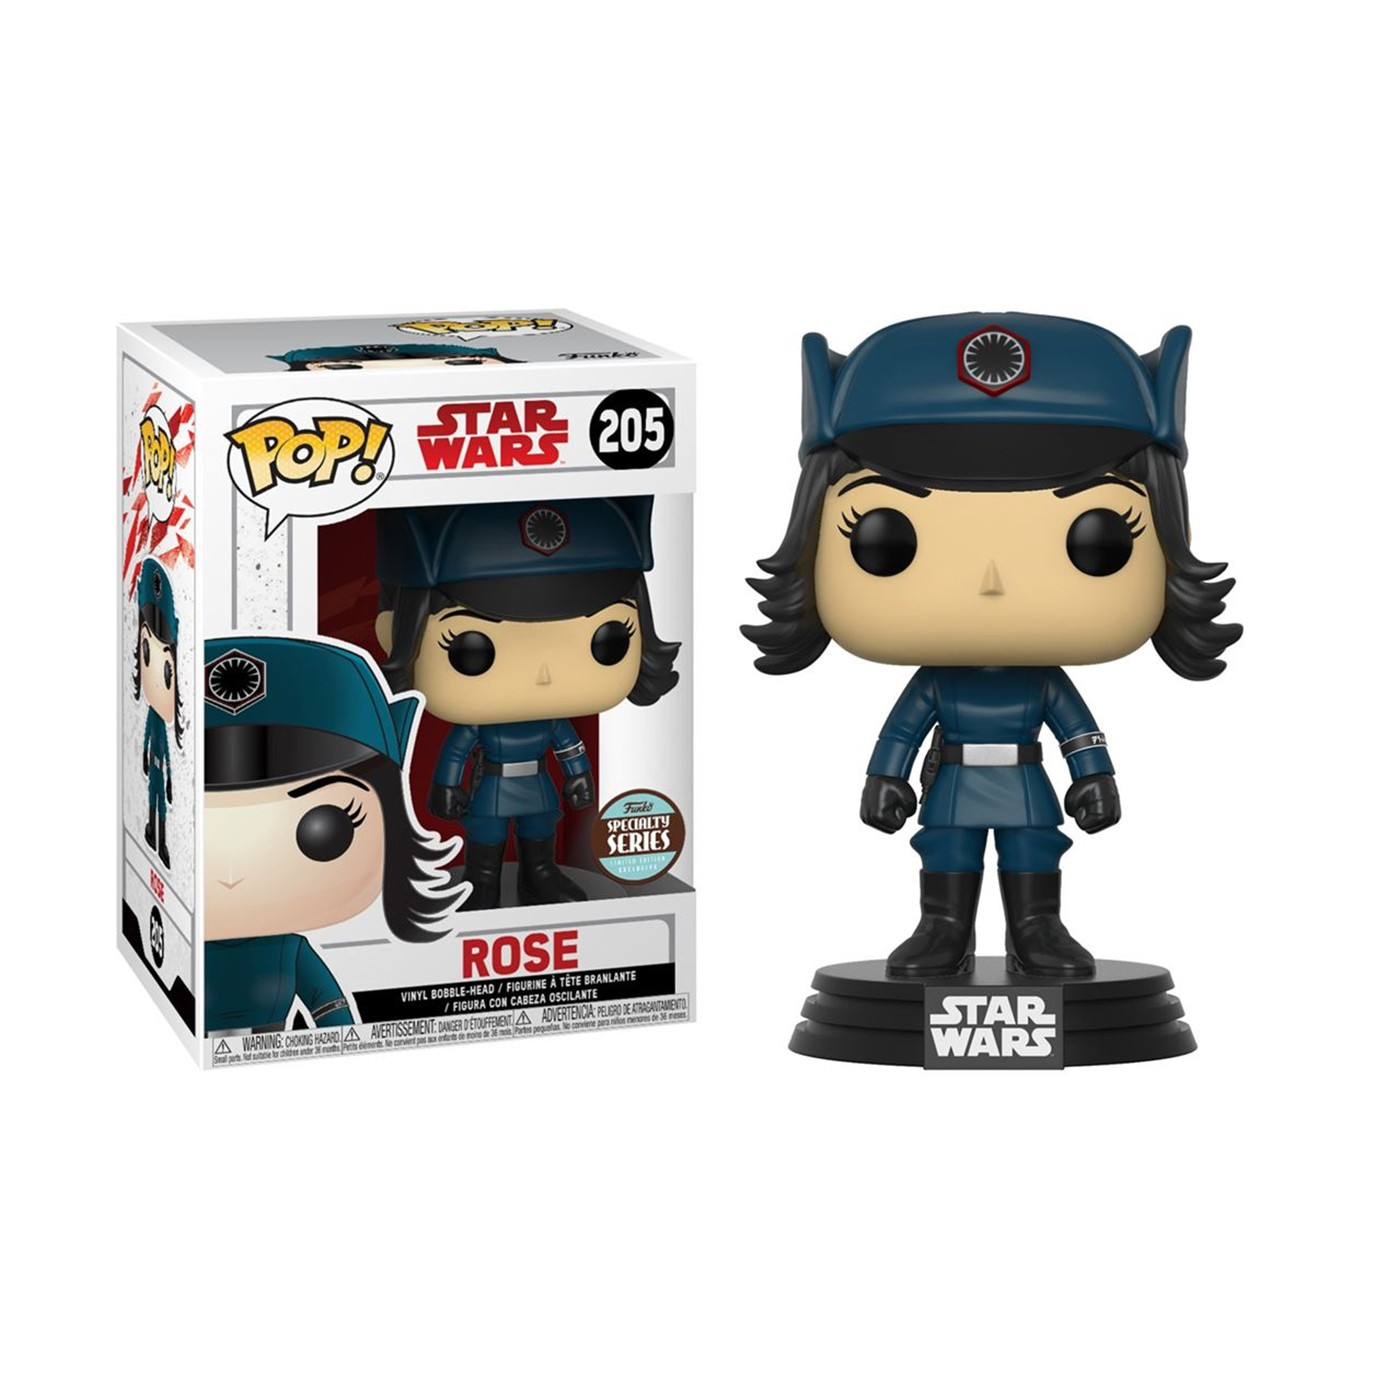 Star Wars Last Jedi Rose in Disguise Funko Pop Specialty Series